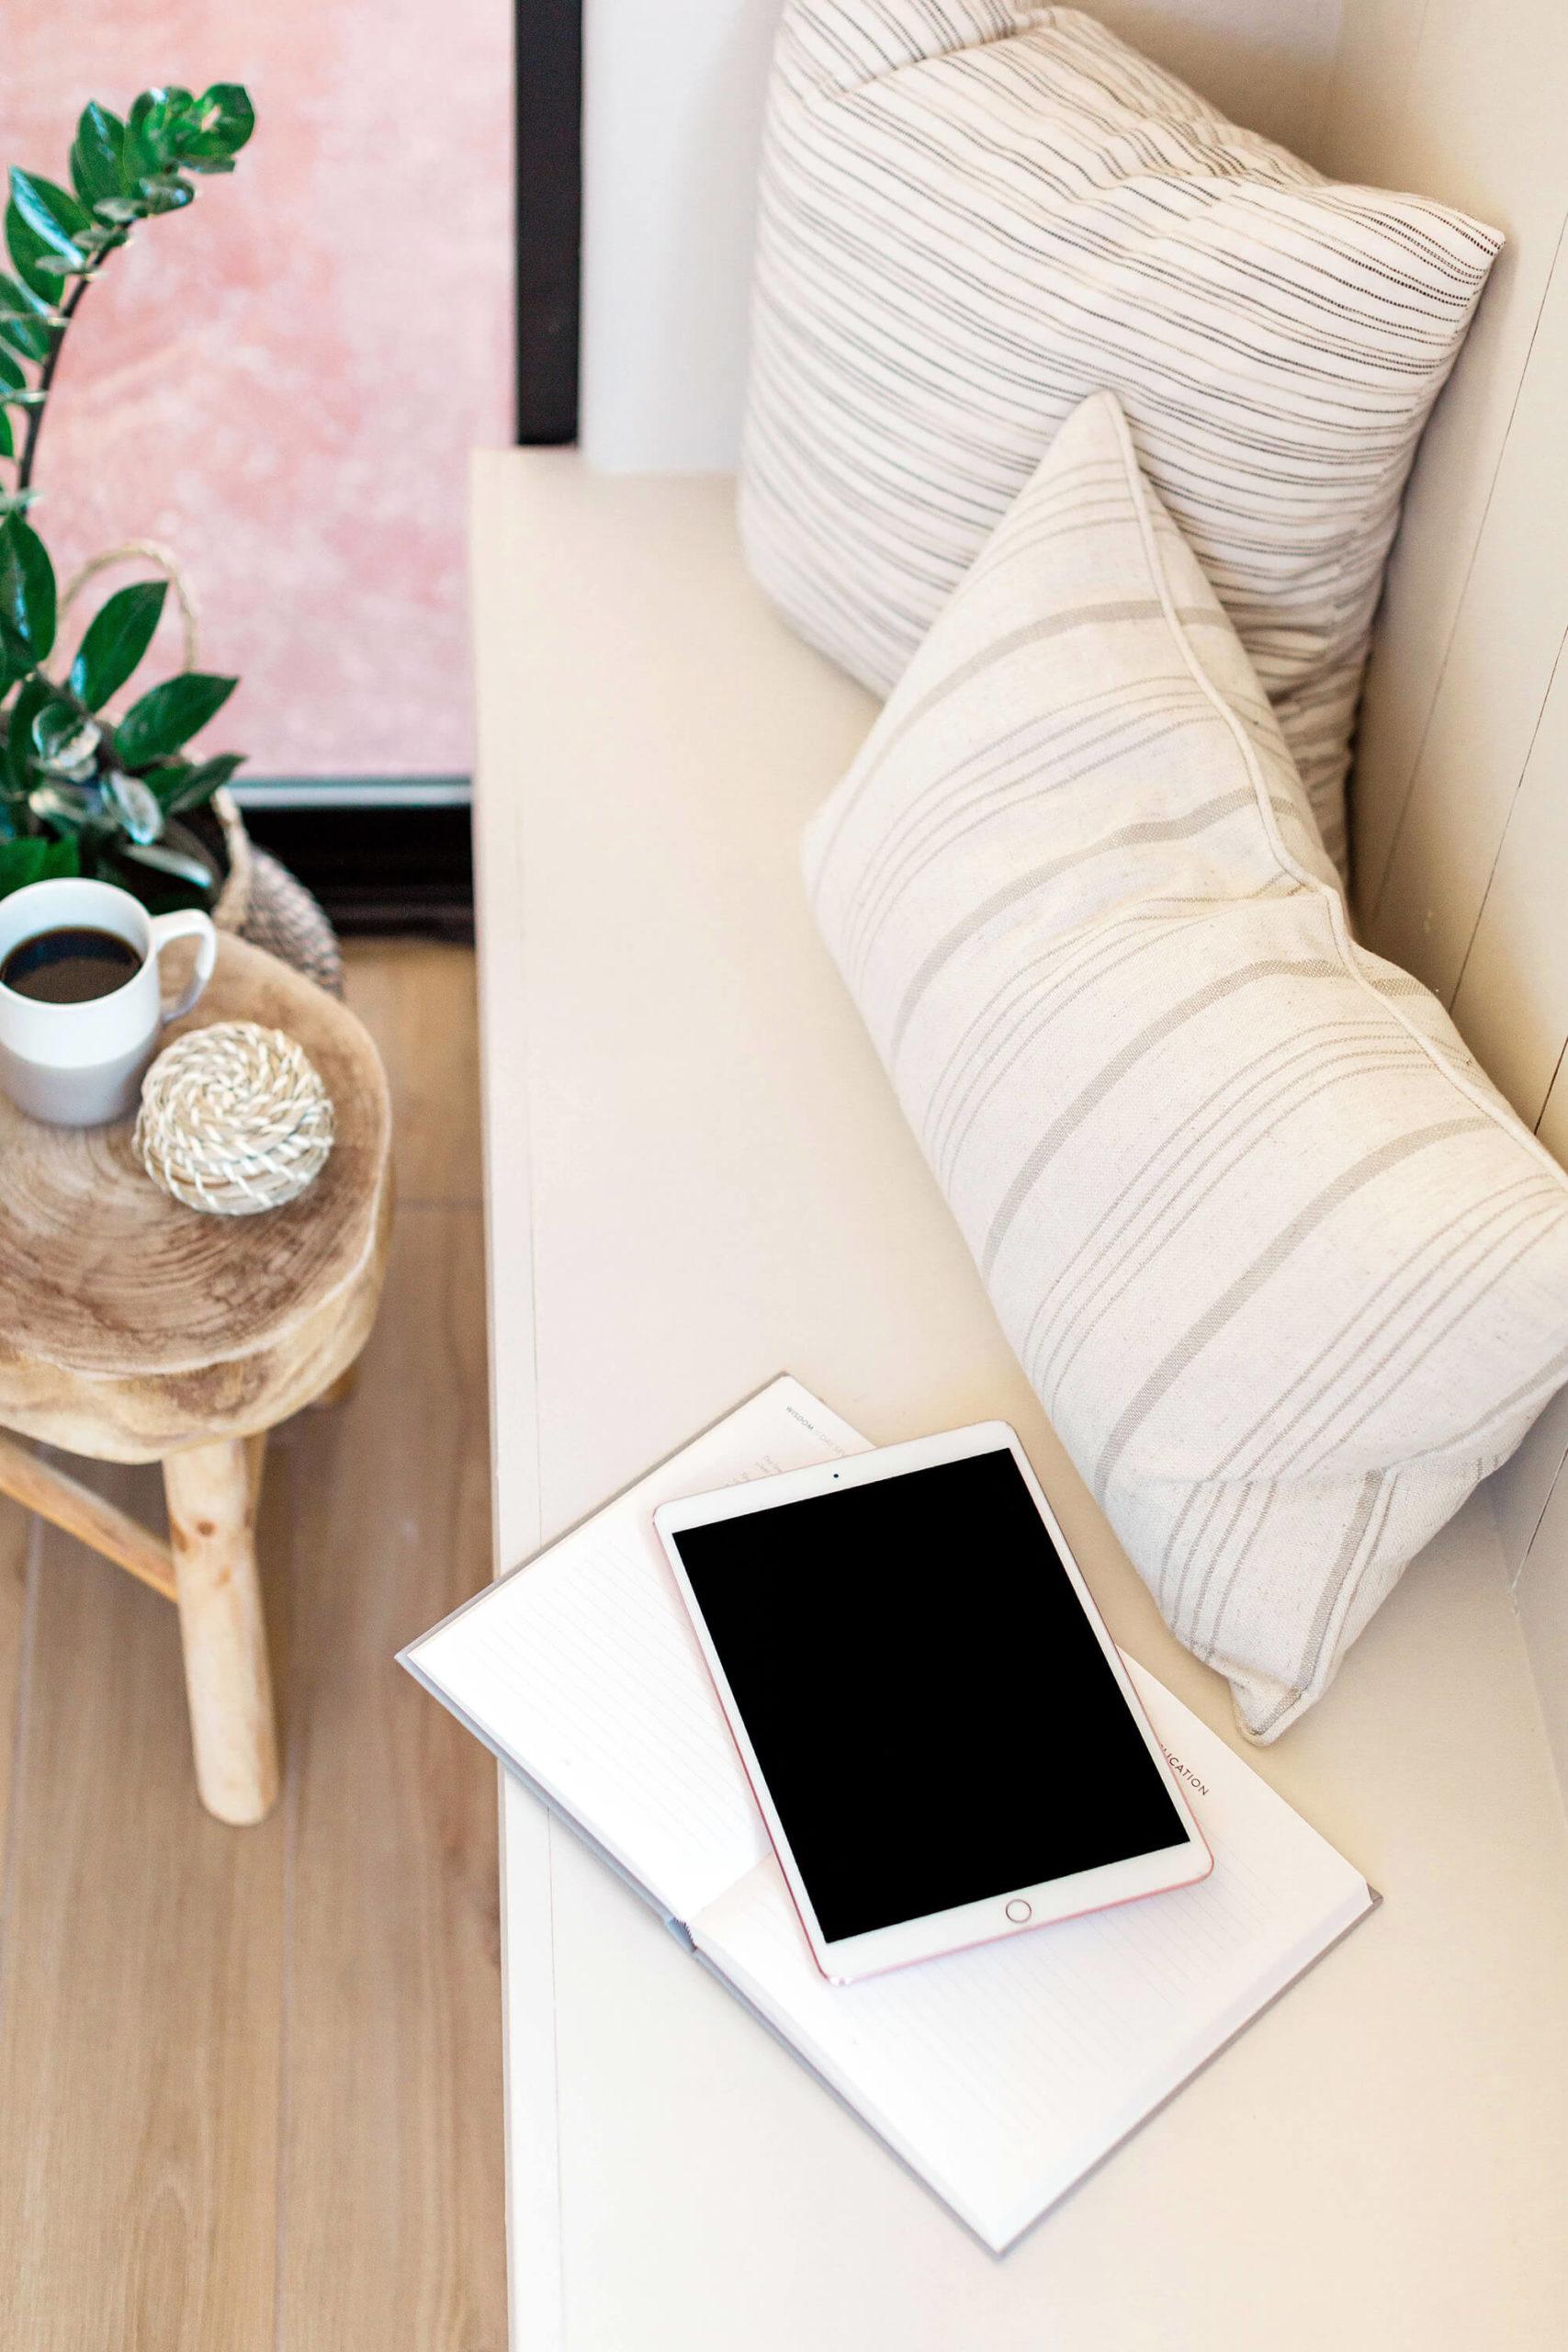 10 Blogging Tasks every beginner Blogger should do